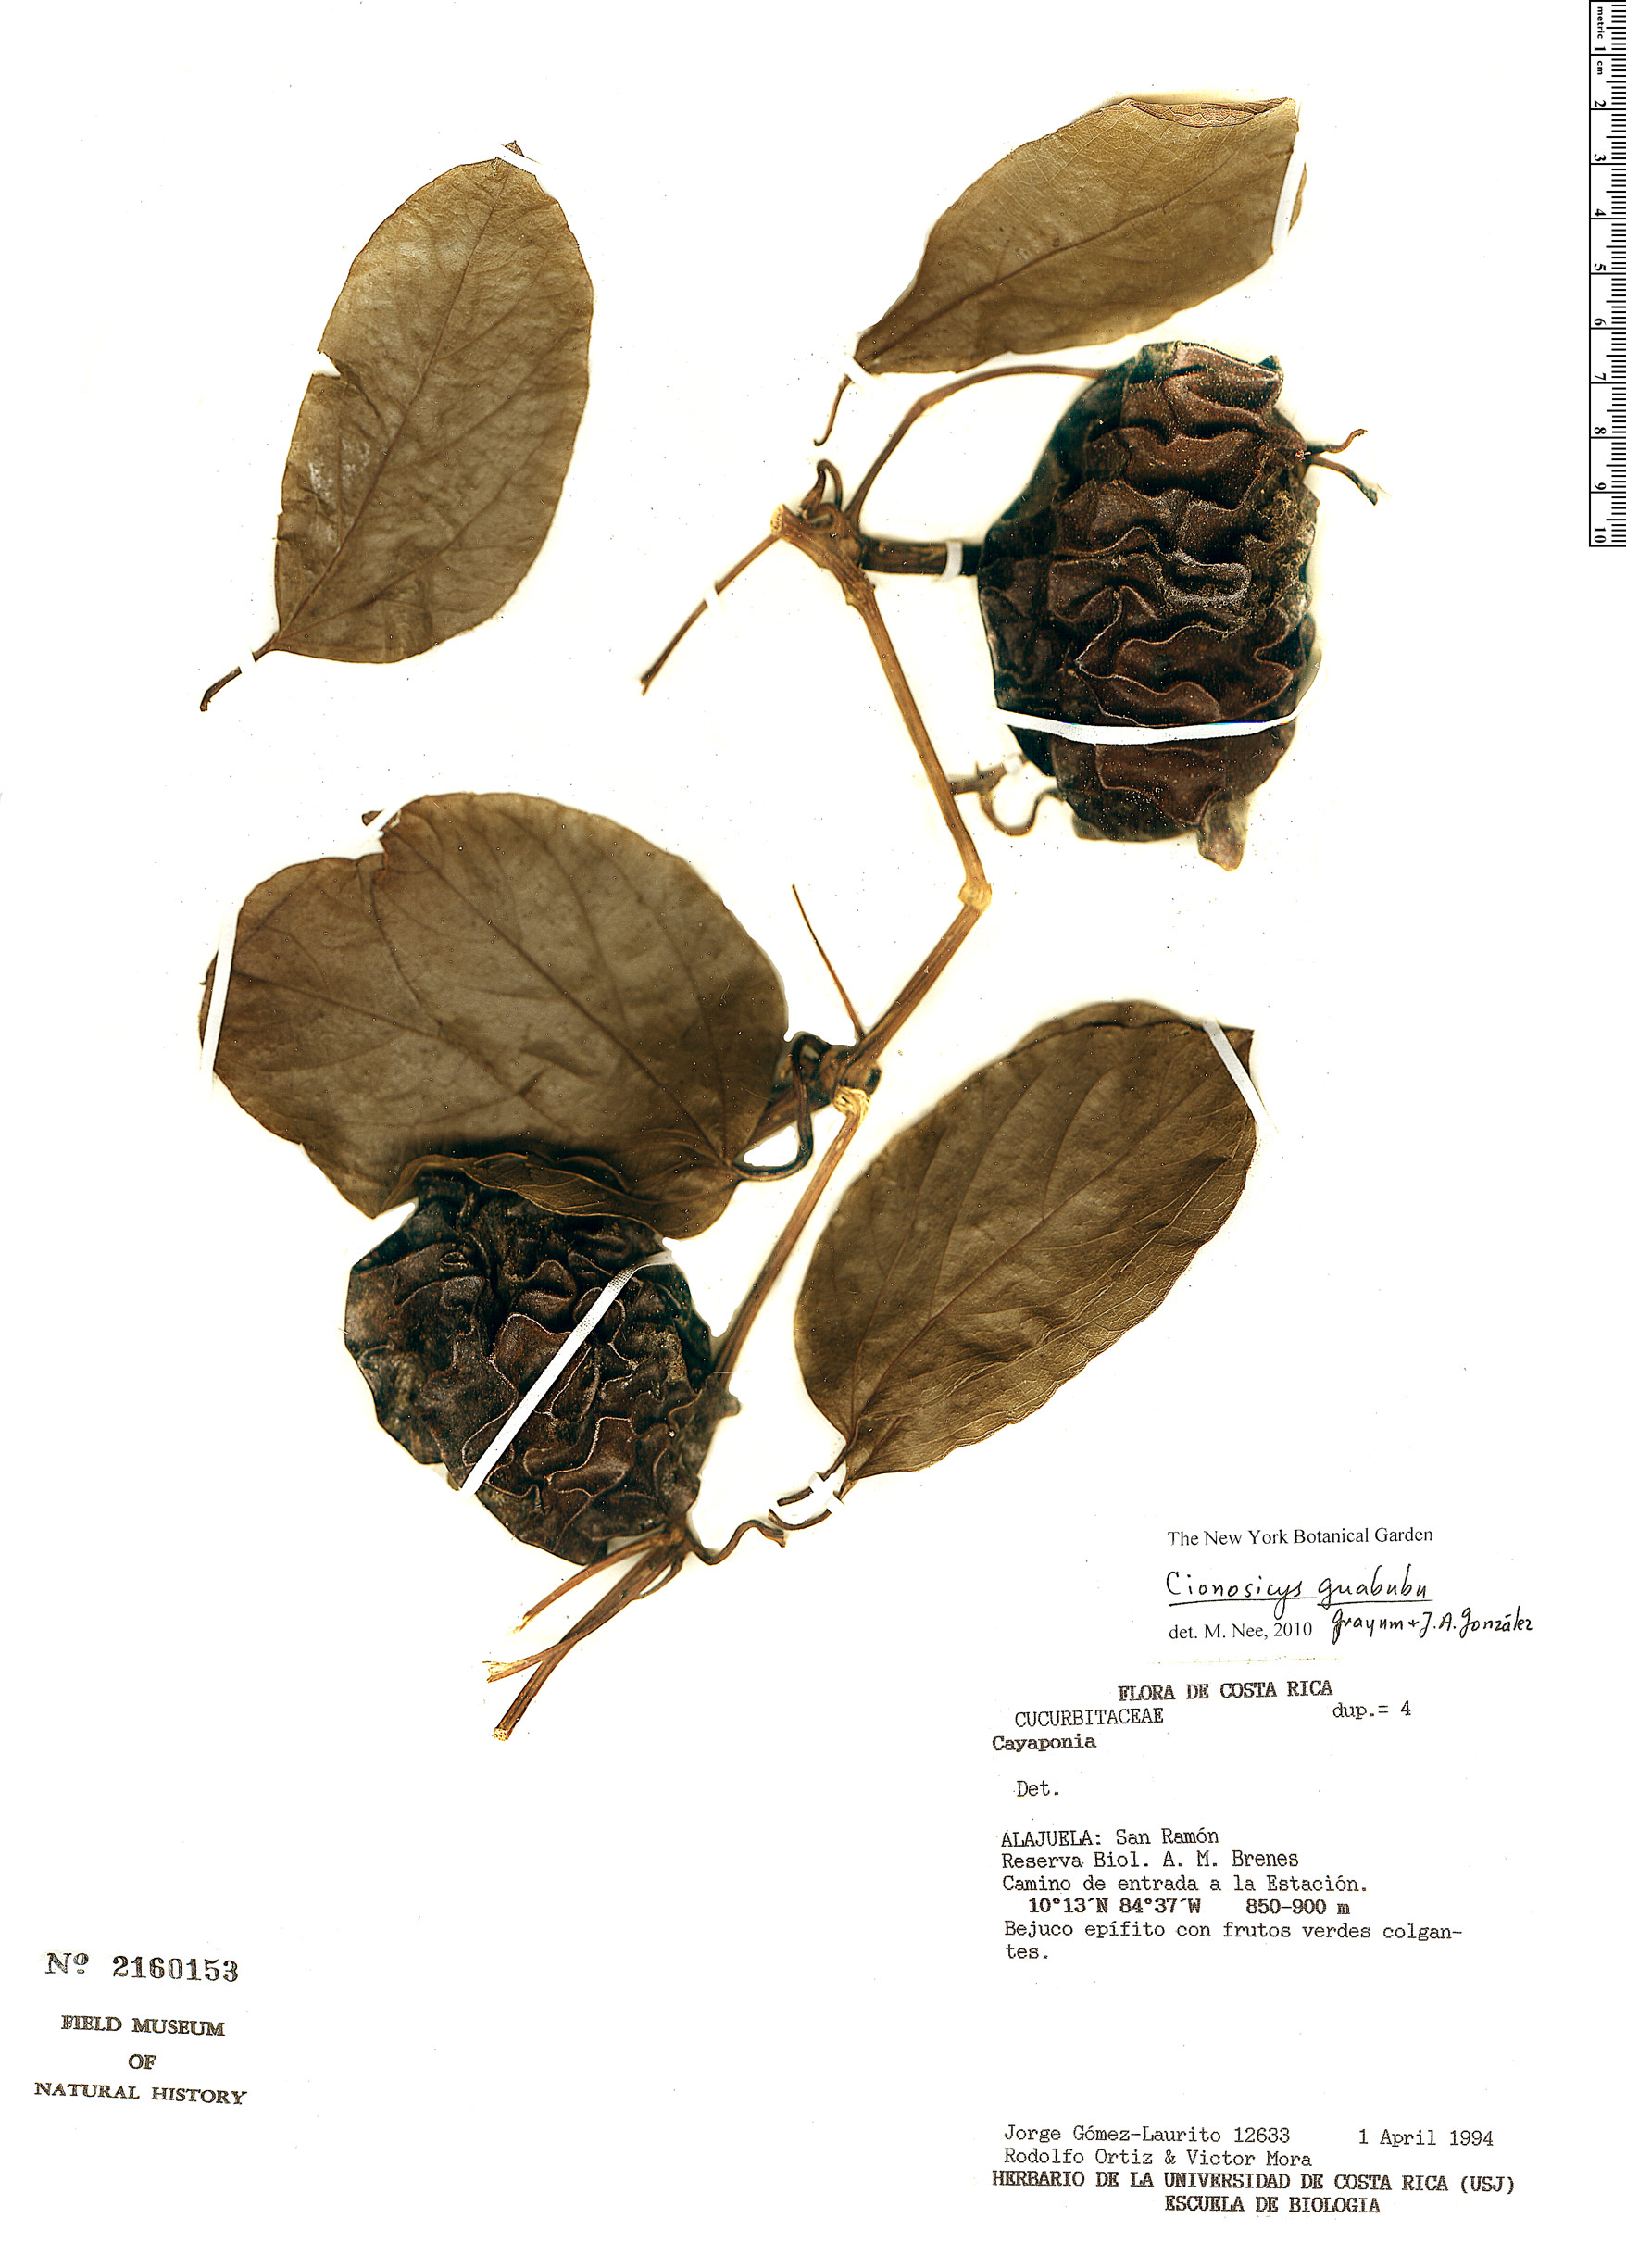 Espécimen: Cionosicys guabubu